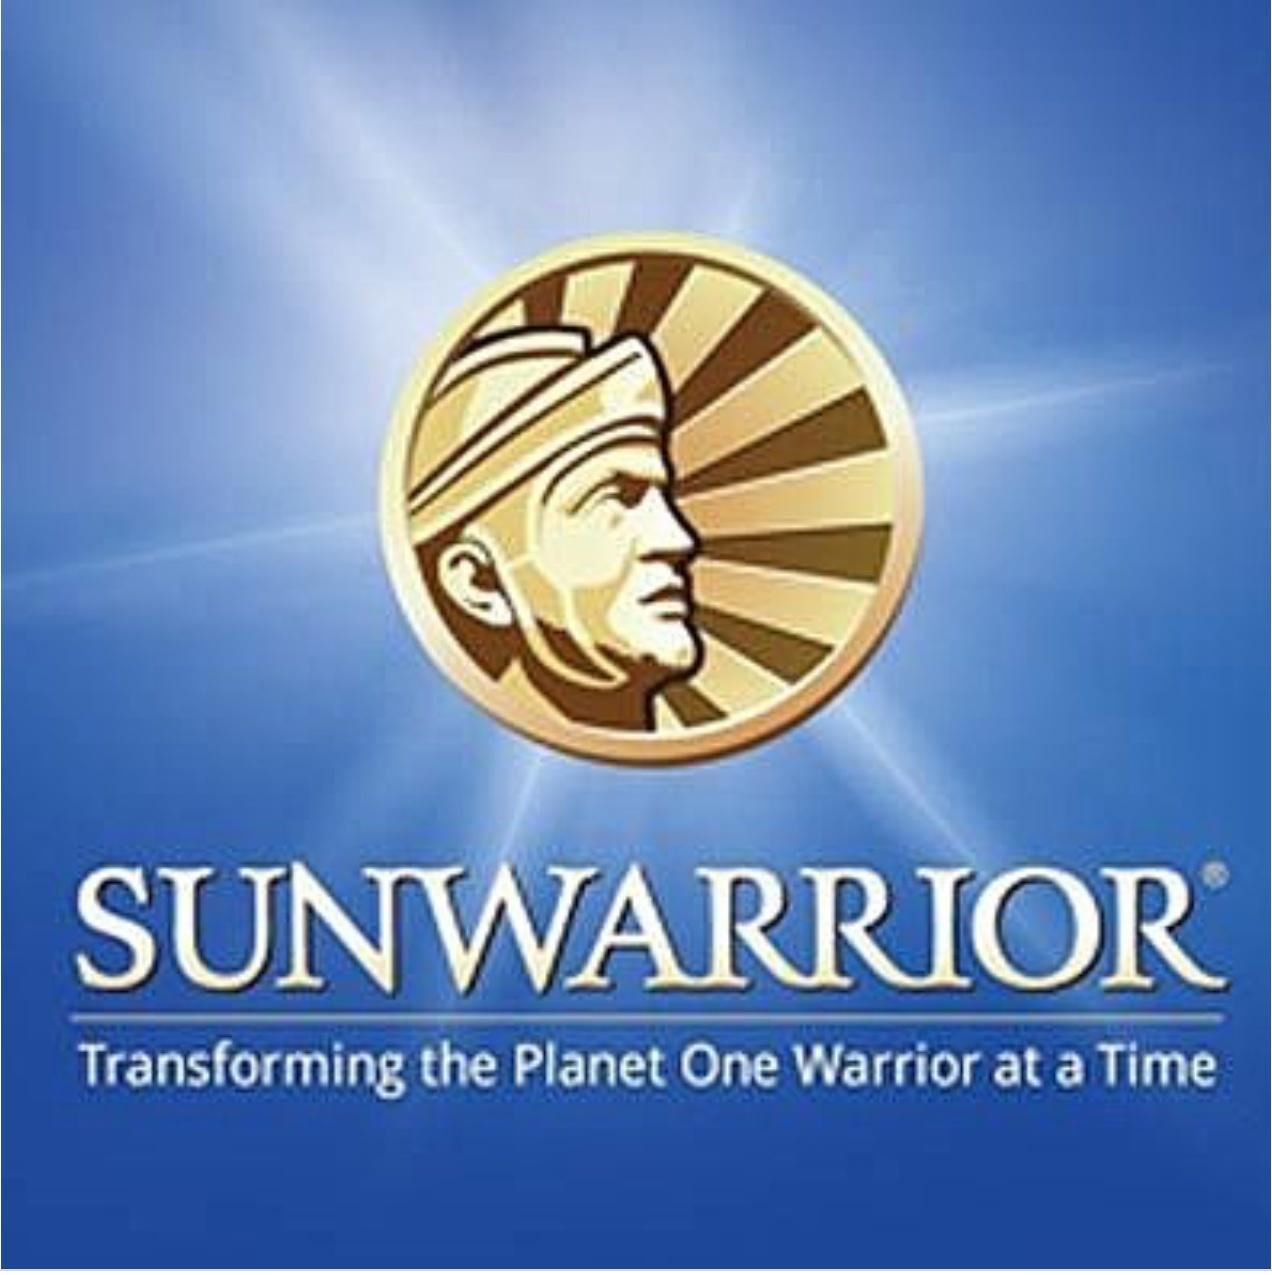 sunwarrior logo